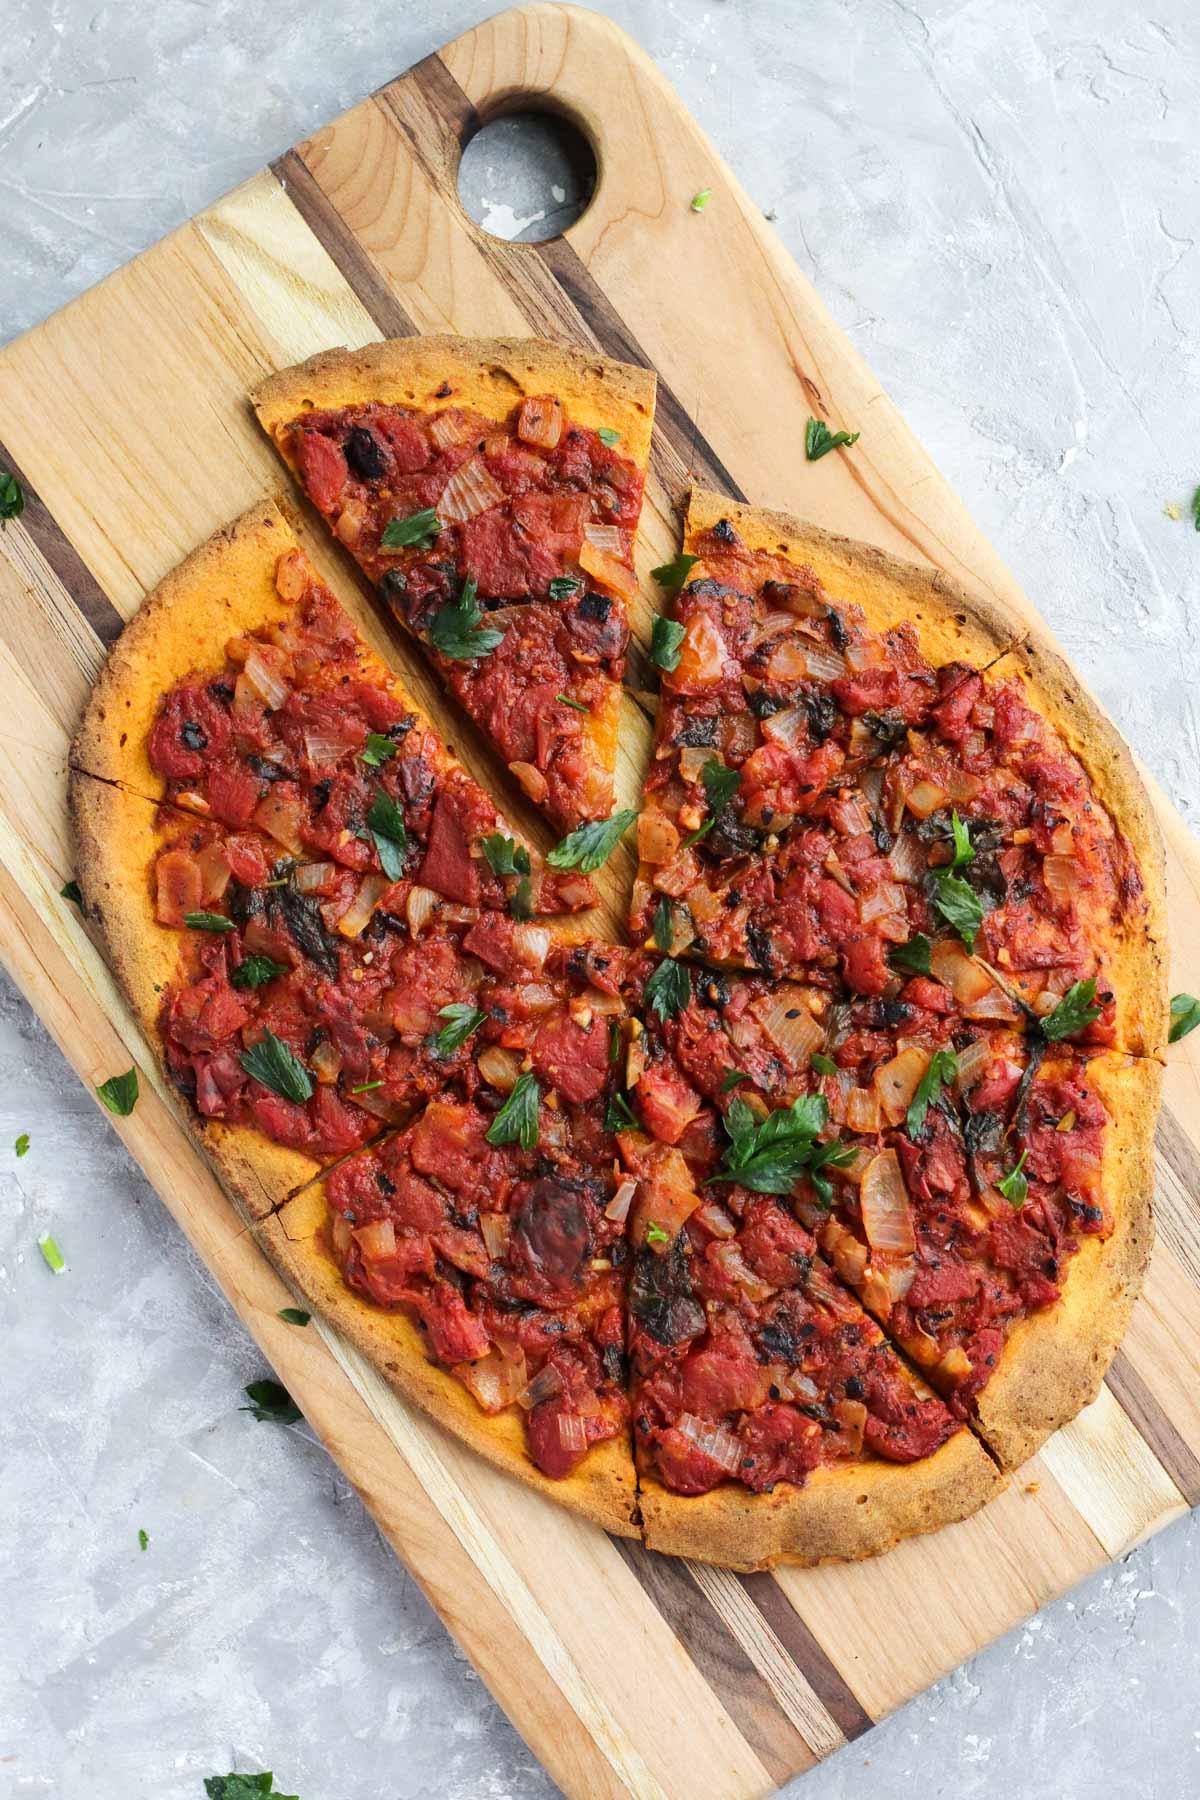 Overhead shot of pizza.